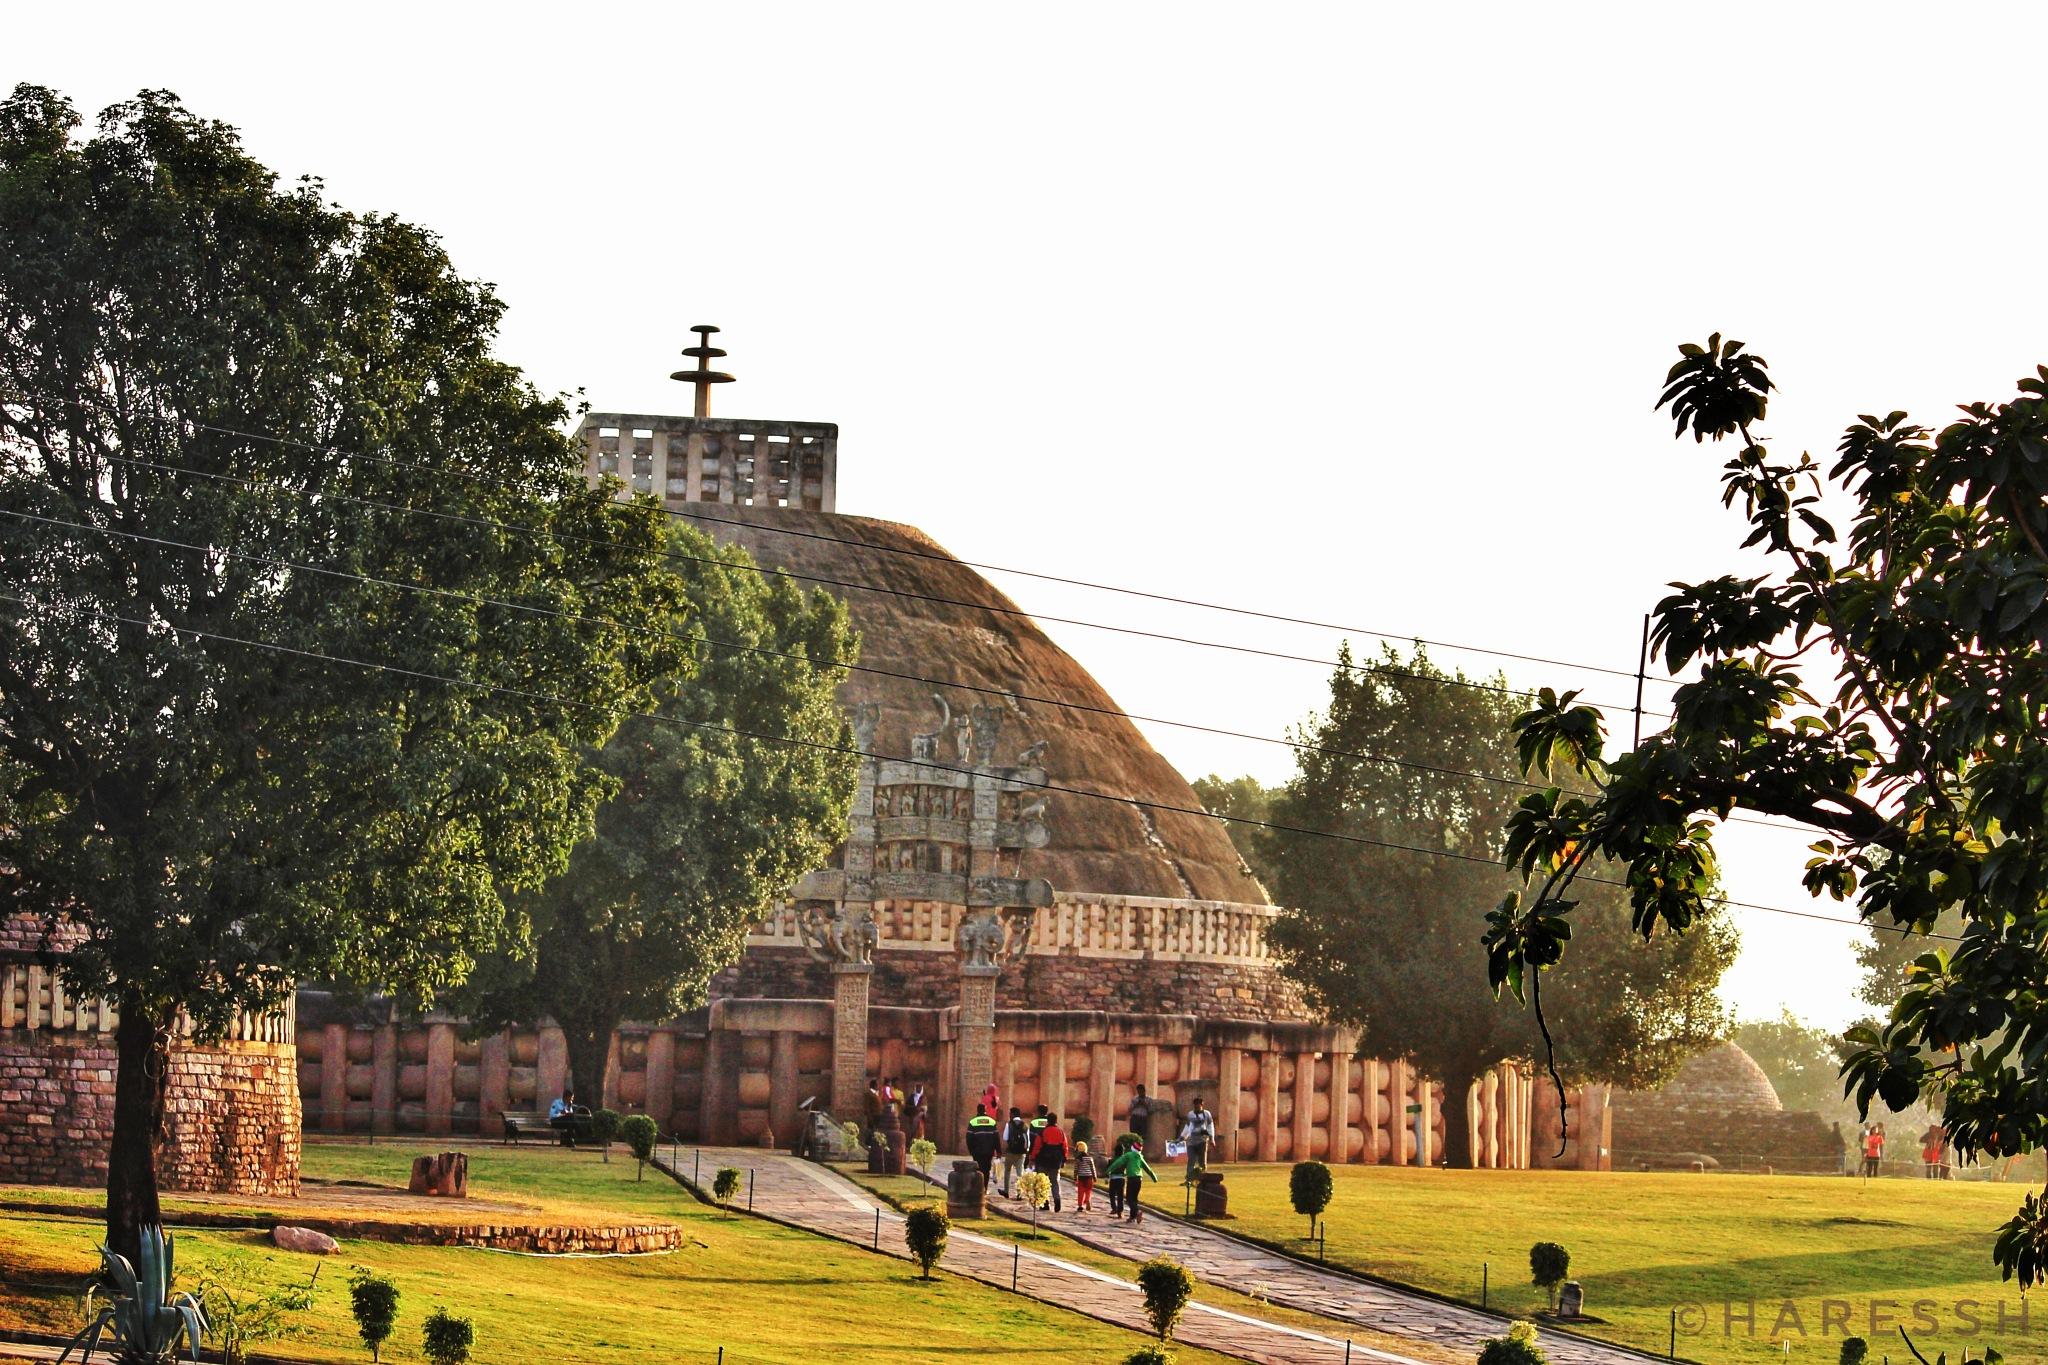 Monument.. #buddhism #stupa #indiapictures #incredibleindia #mptourism #heartofindia #sanchi #buddhi by Haressh